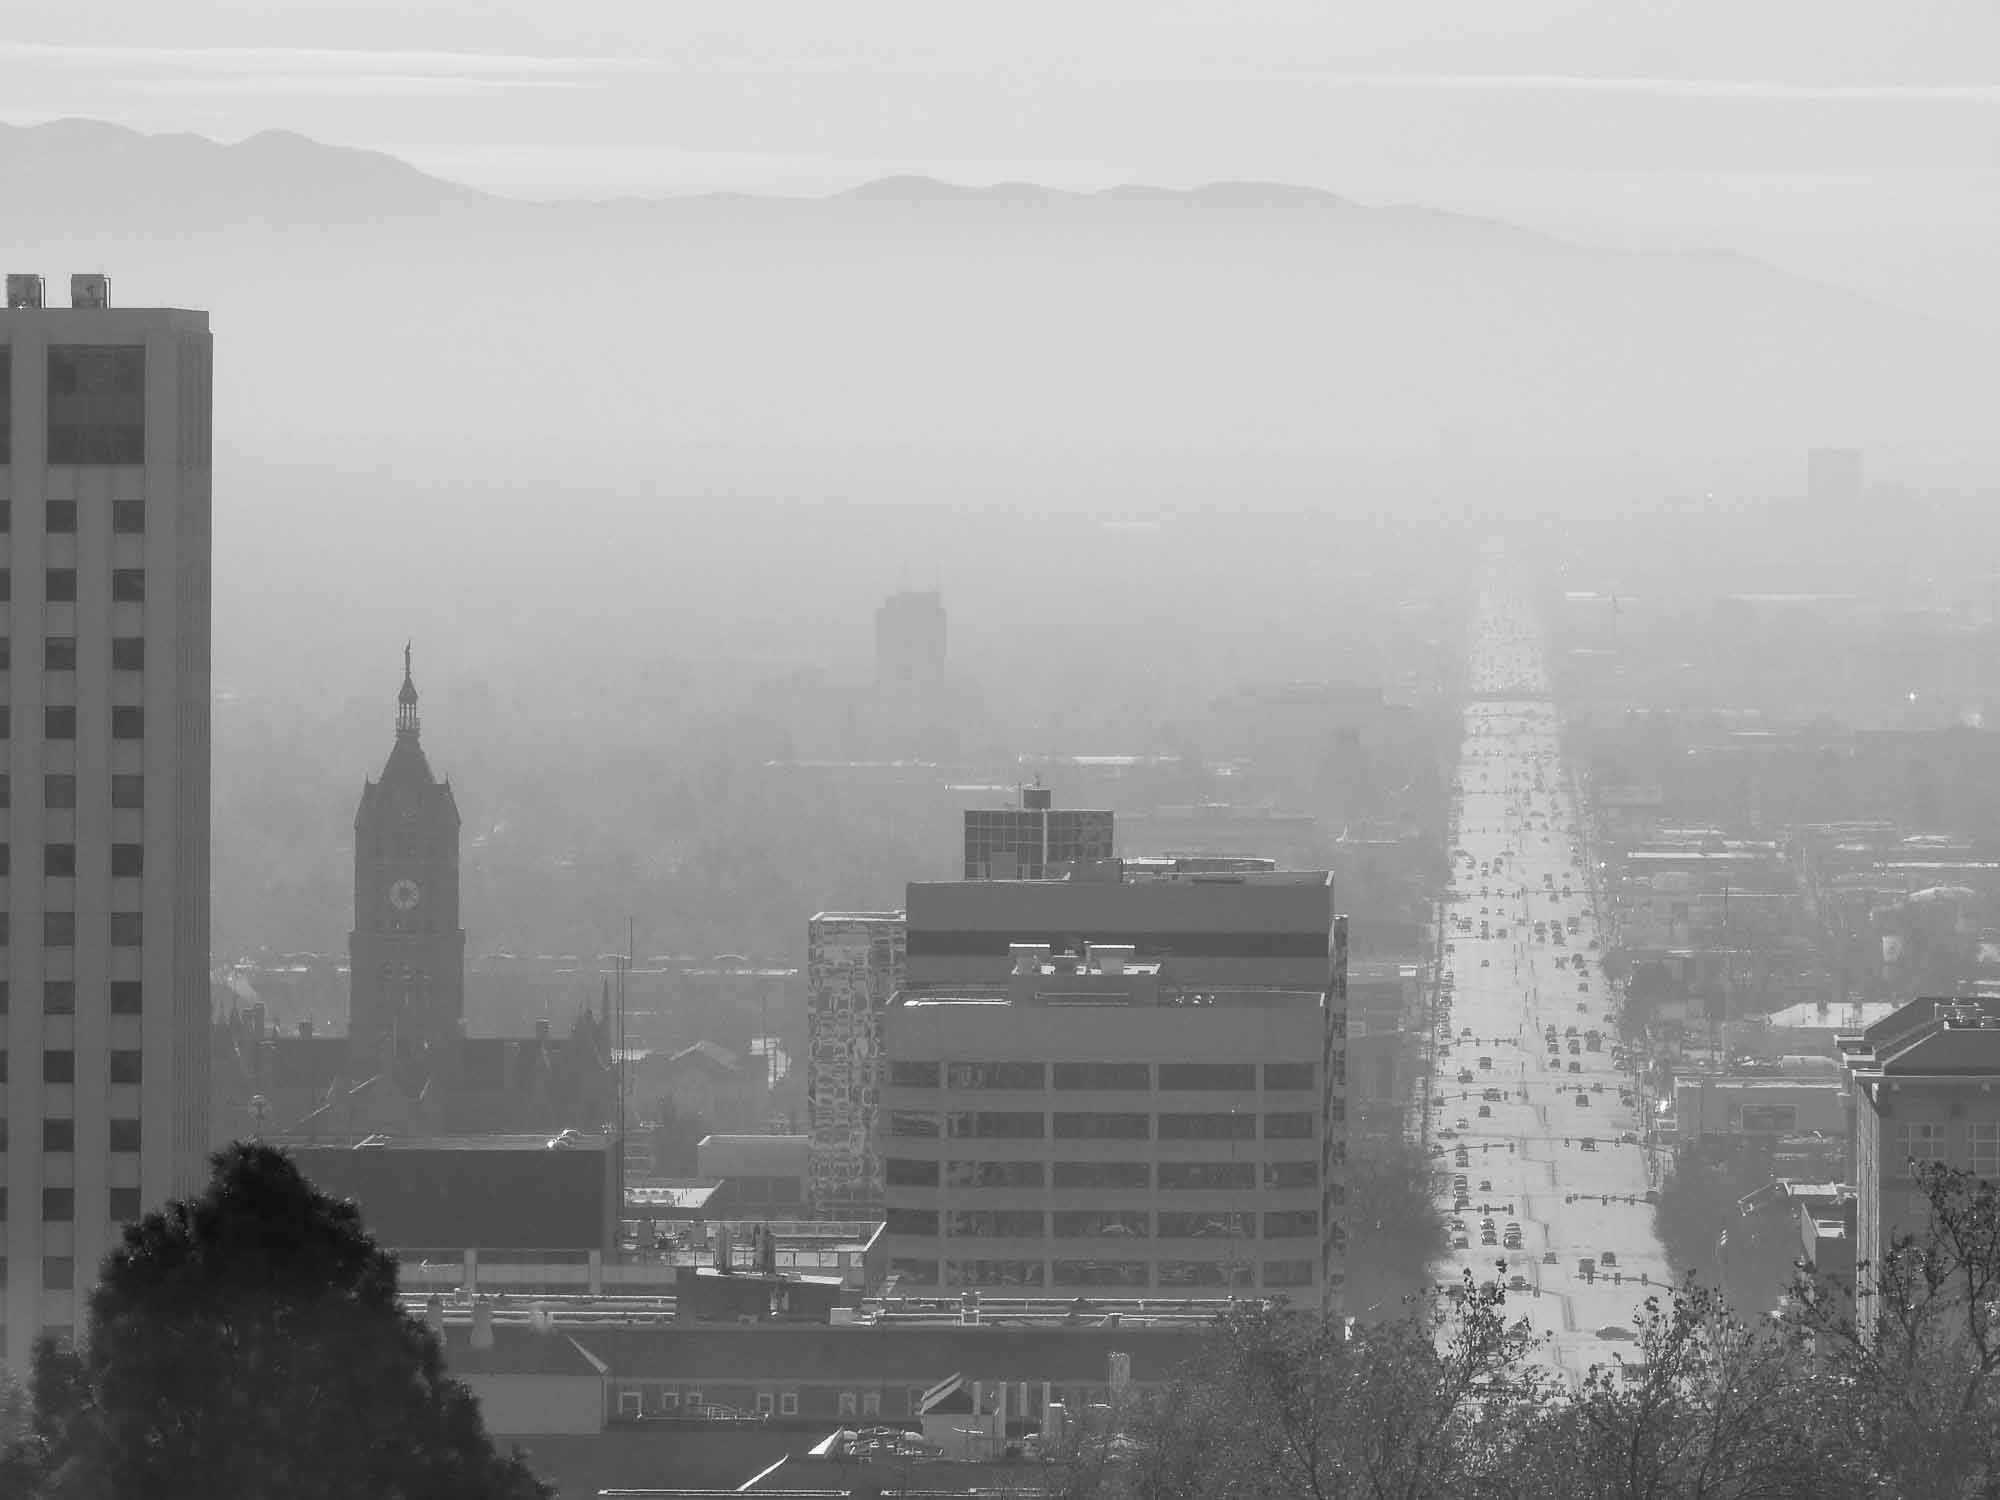 inversion pollution in salt lake city